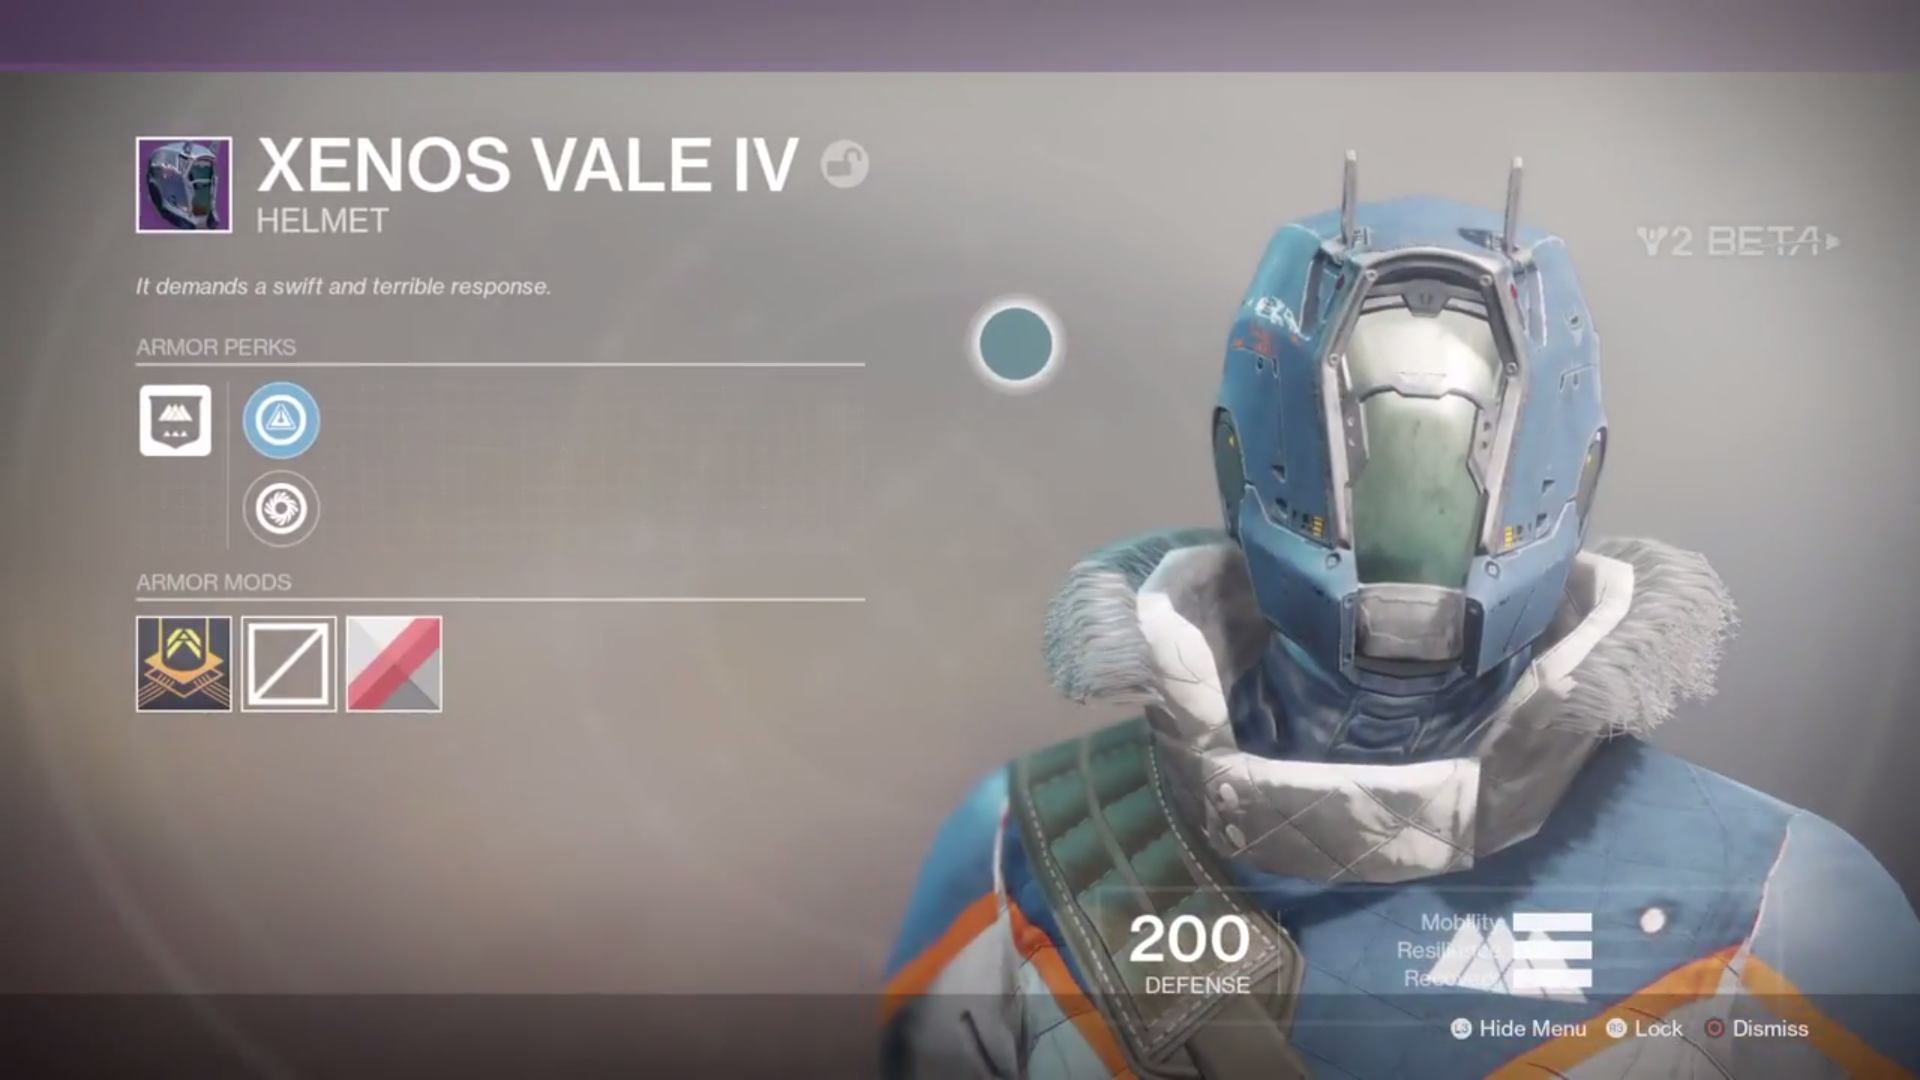 destiny 2 beta xenos vale IV helmet